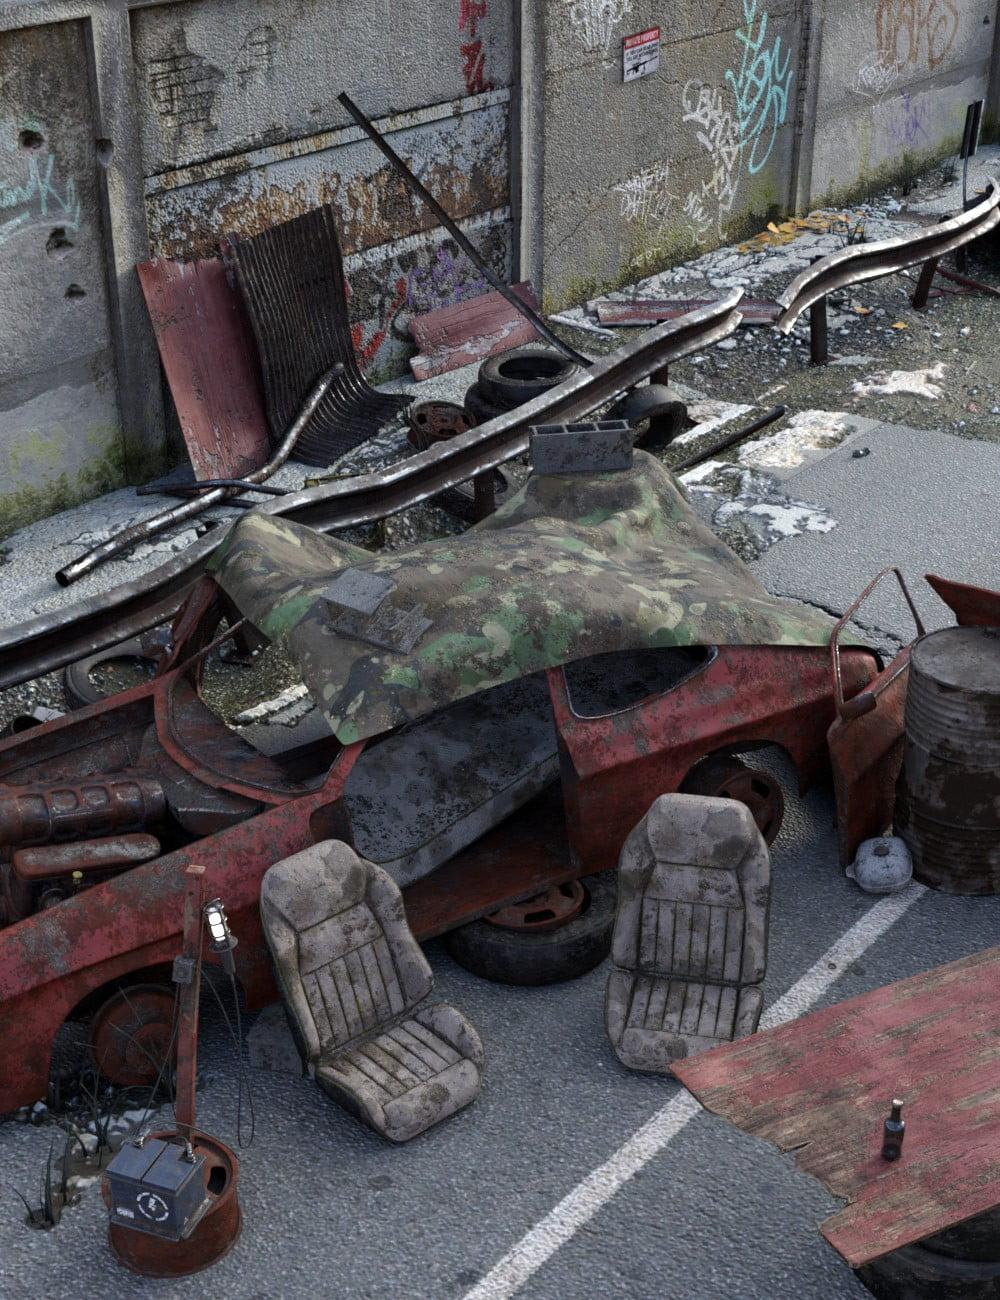 Post-Apocalyptic World: Car Wreck